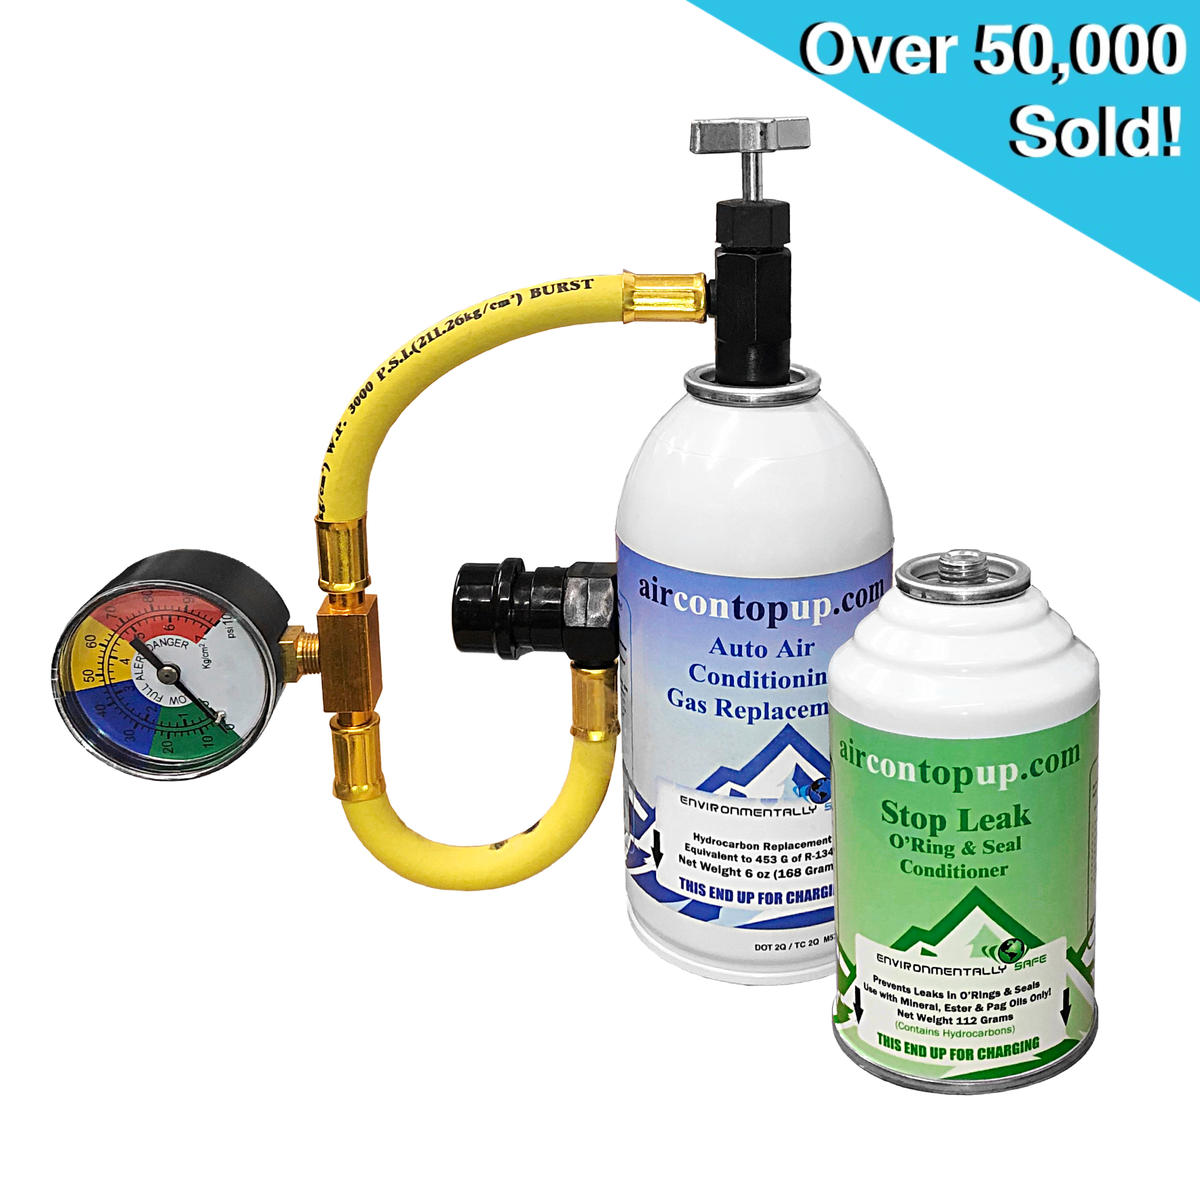 Car AC Aircon Air Con Air Conditioning Gas Top up Recharge Refill Regas Tool Kit